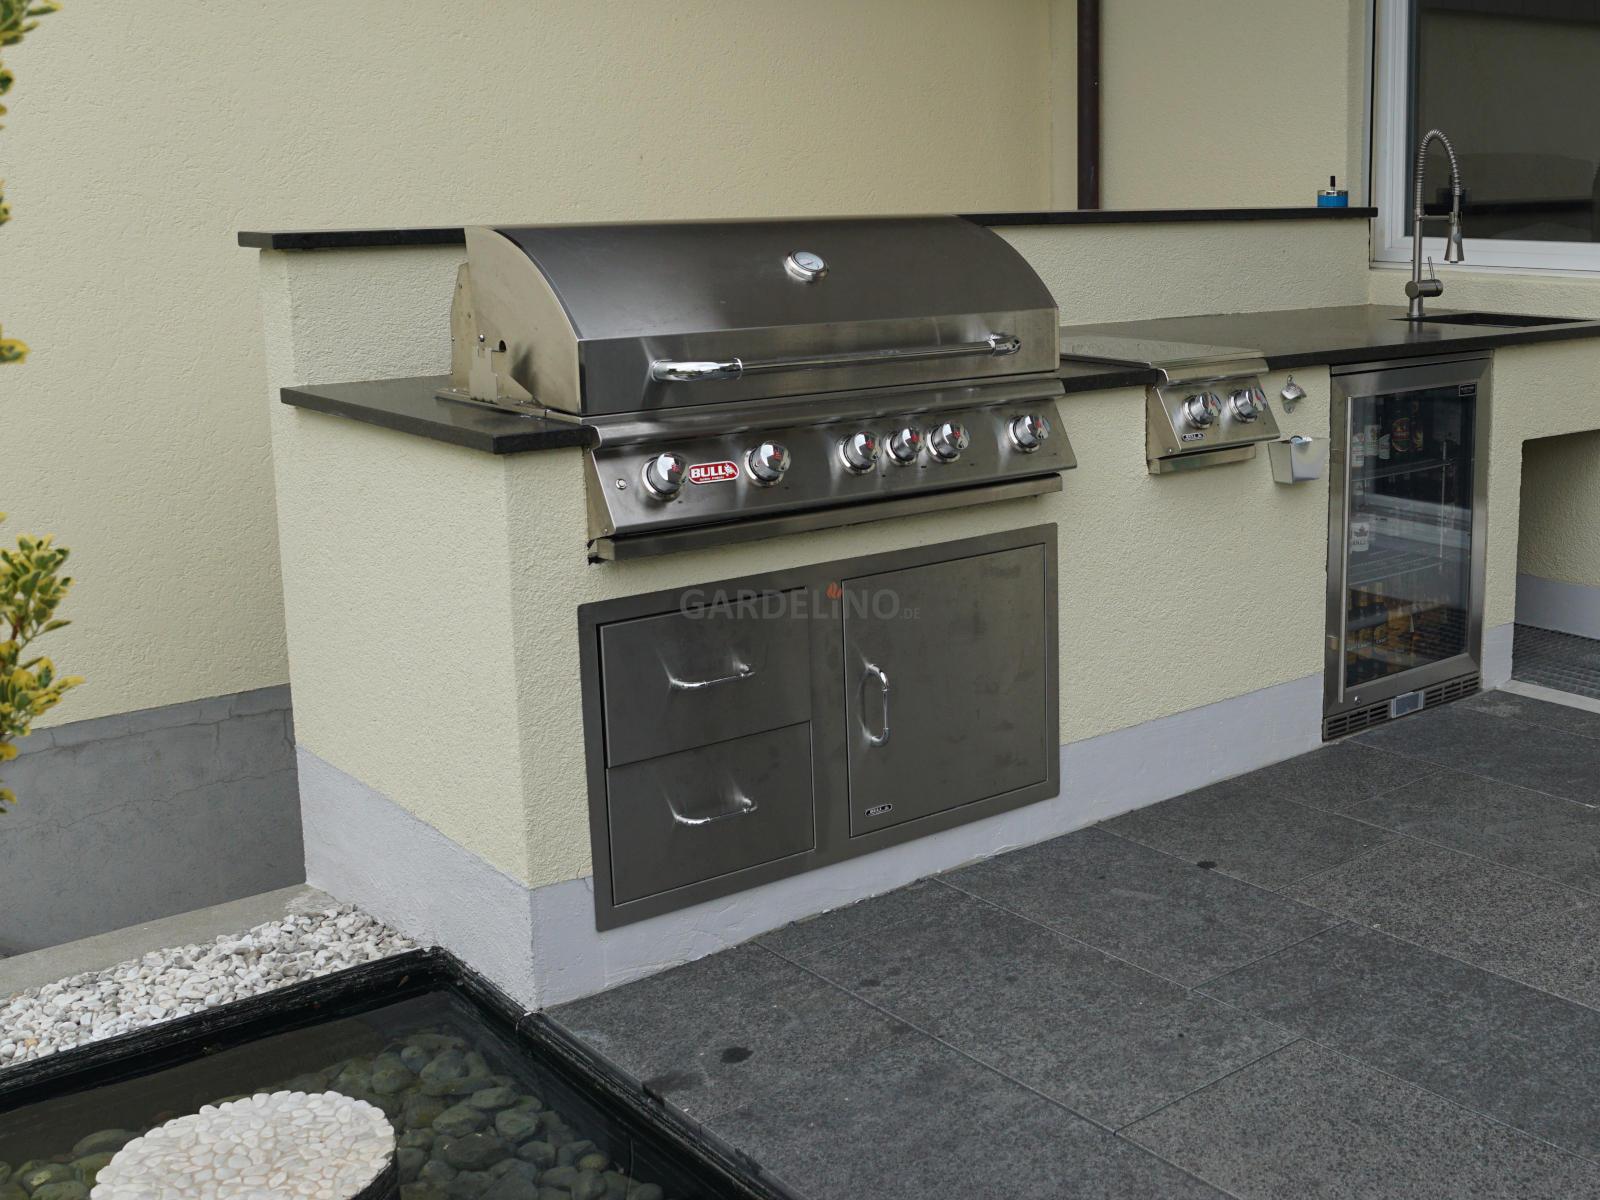 Outdoorküche Mit Gasgrill Qualität : Broil king regal grill outdoor küche gasgrill burnout in